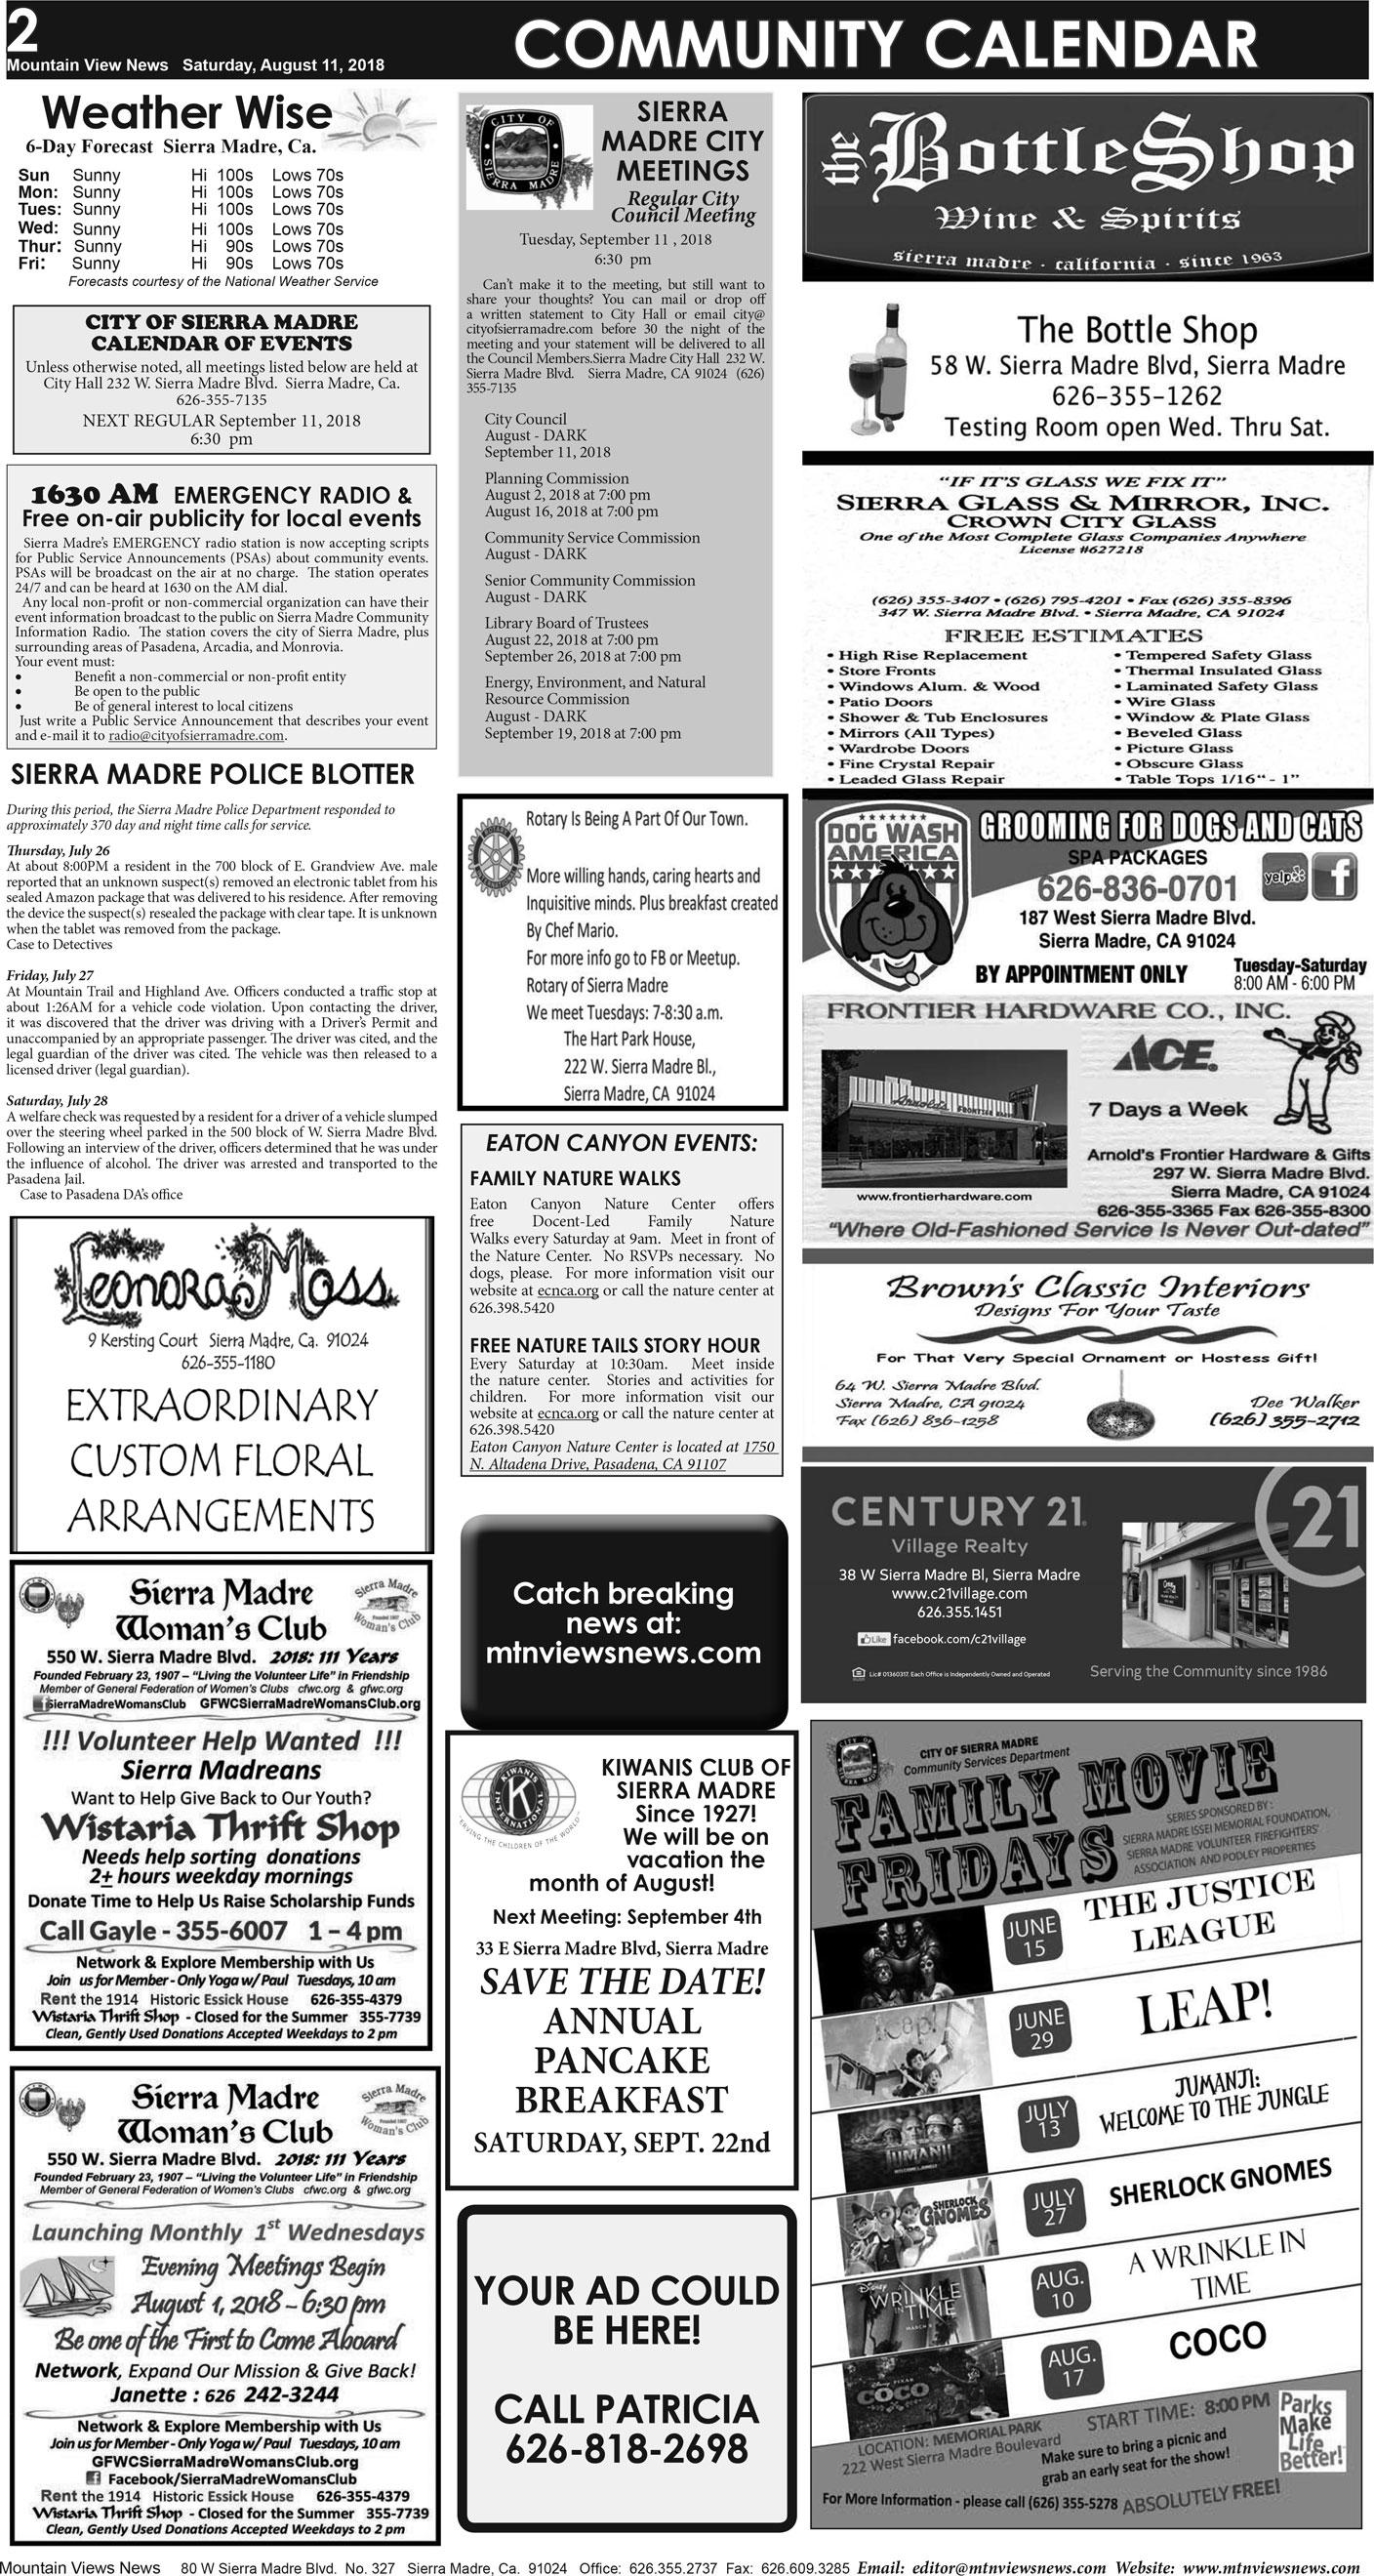 pA:2, v12.32 — Community Calendar — Mountain Views News